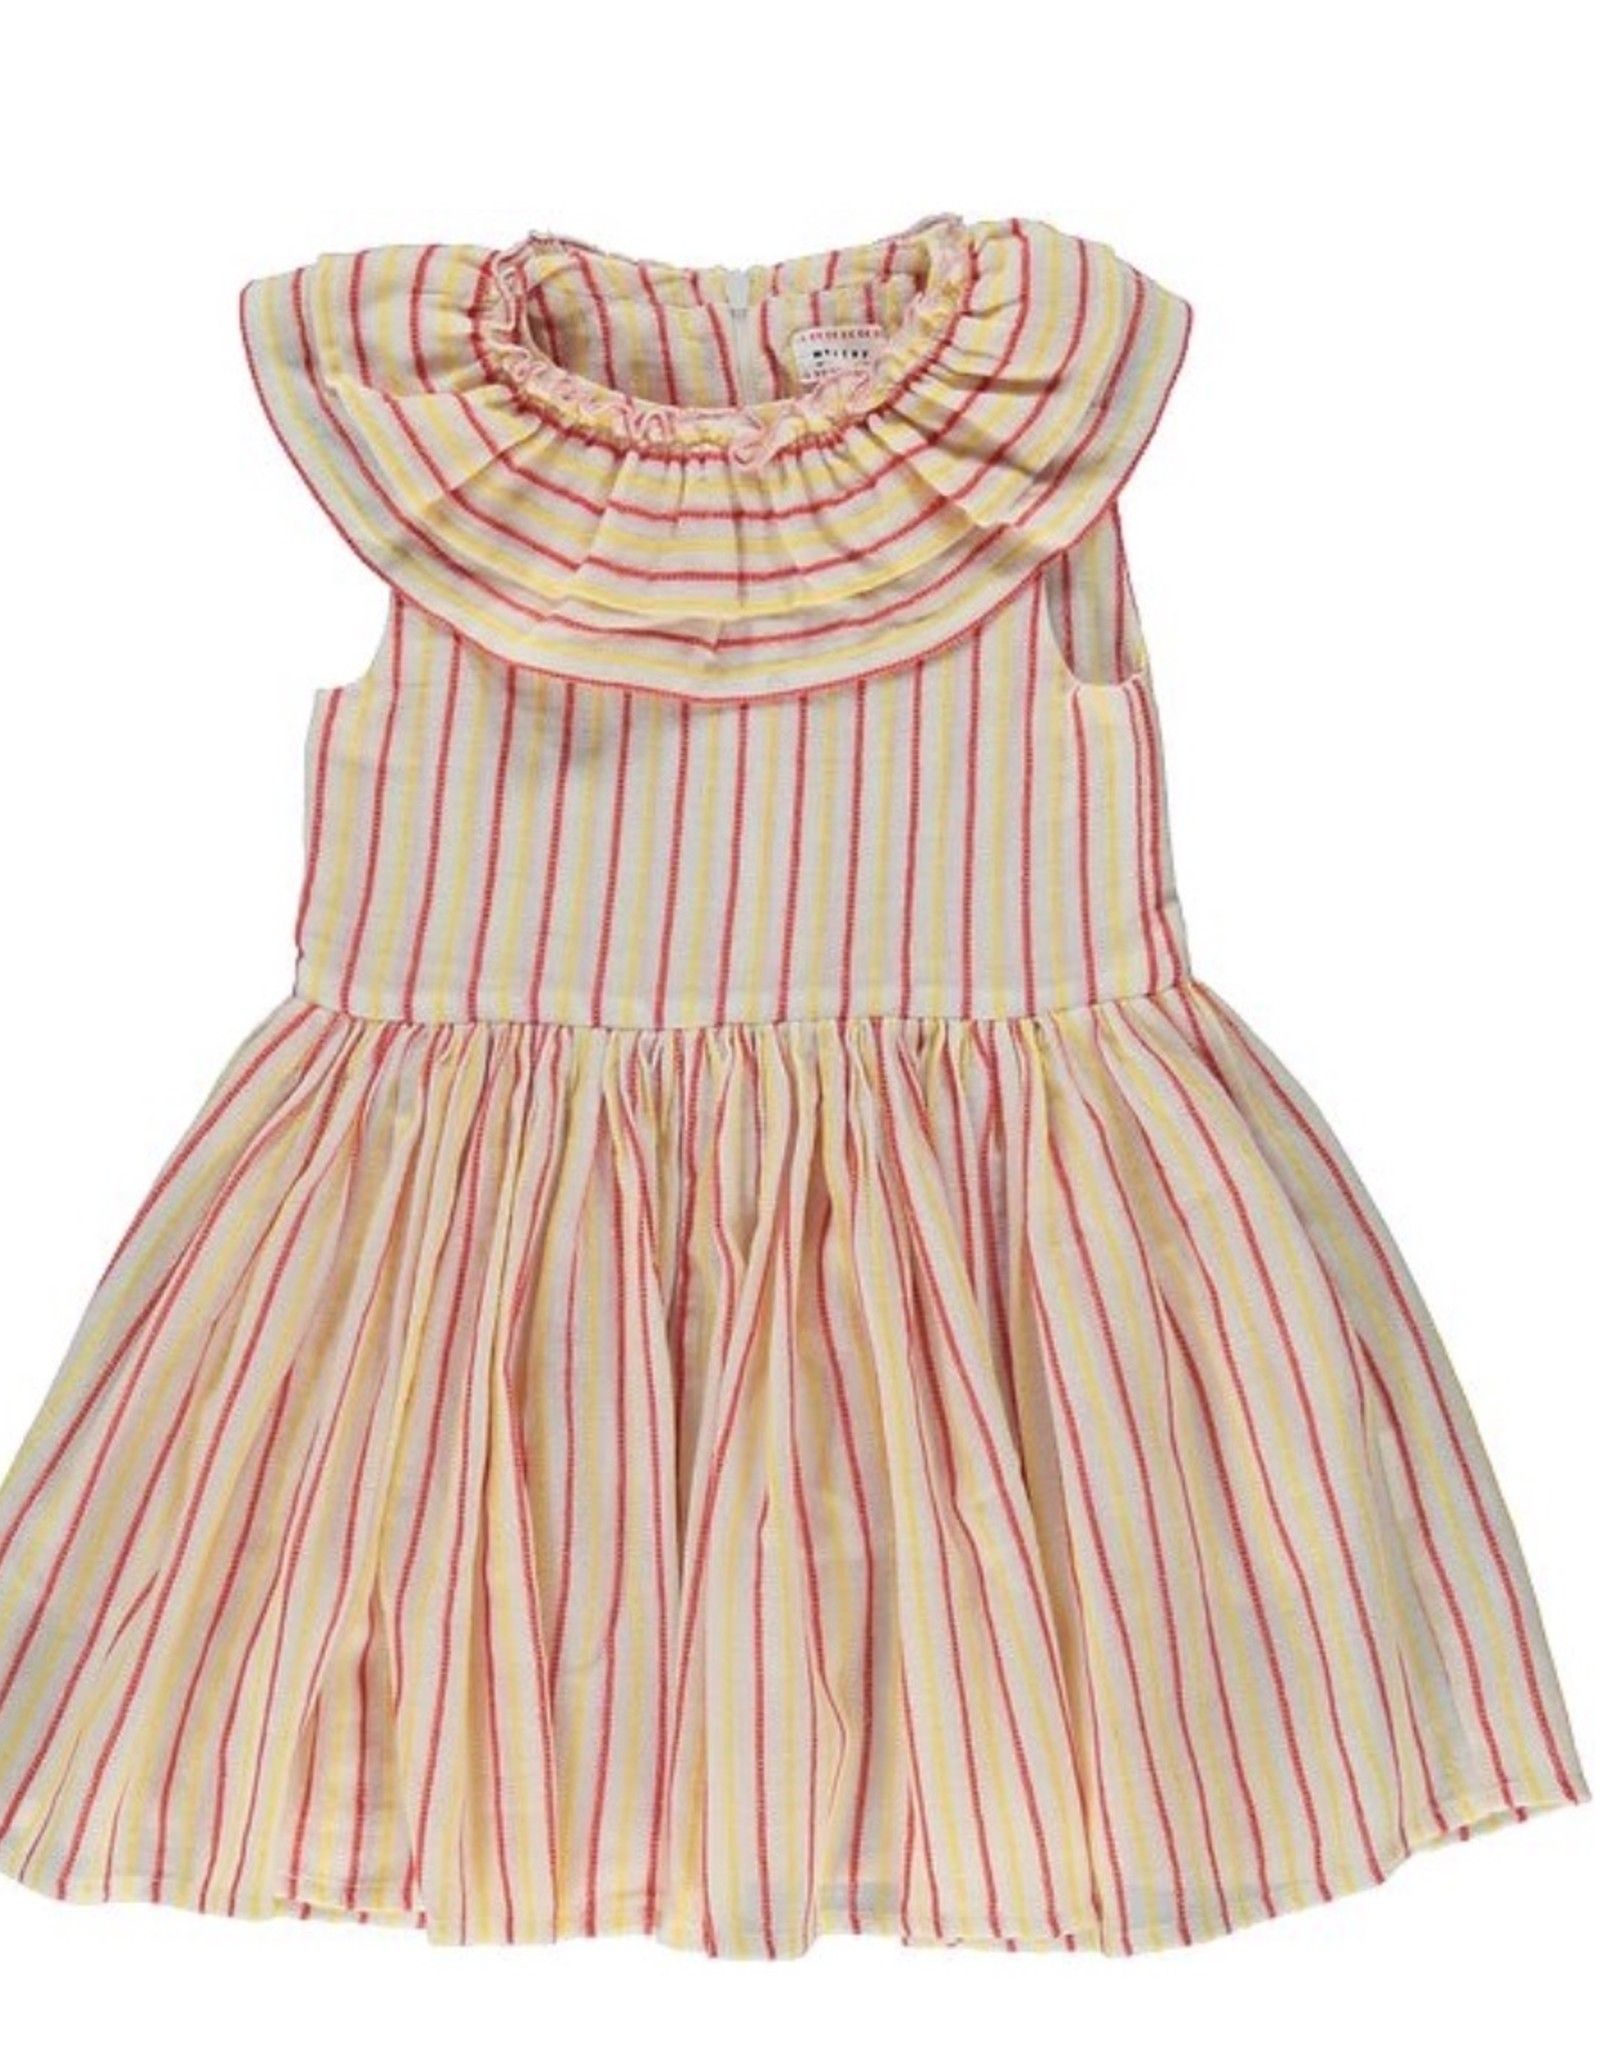 Morley Lilah dress